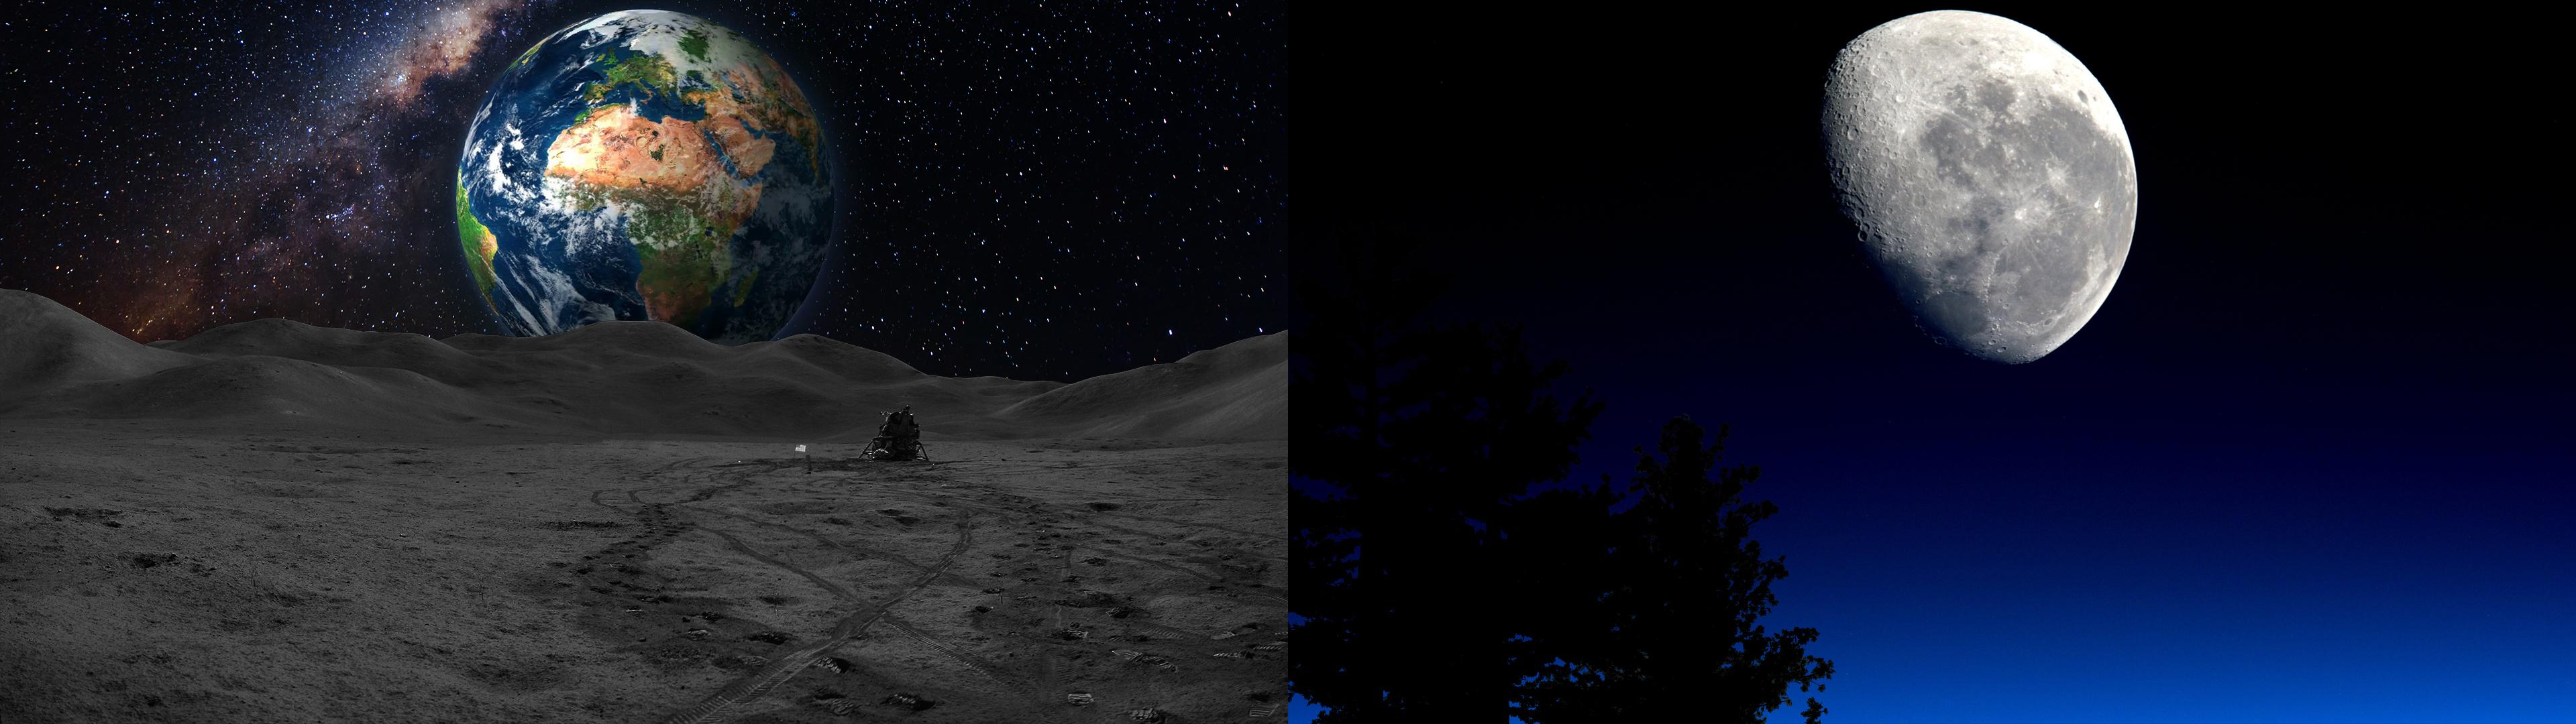 General 3840x1080 dual monitors Moon Earth space